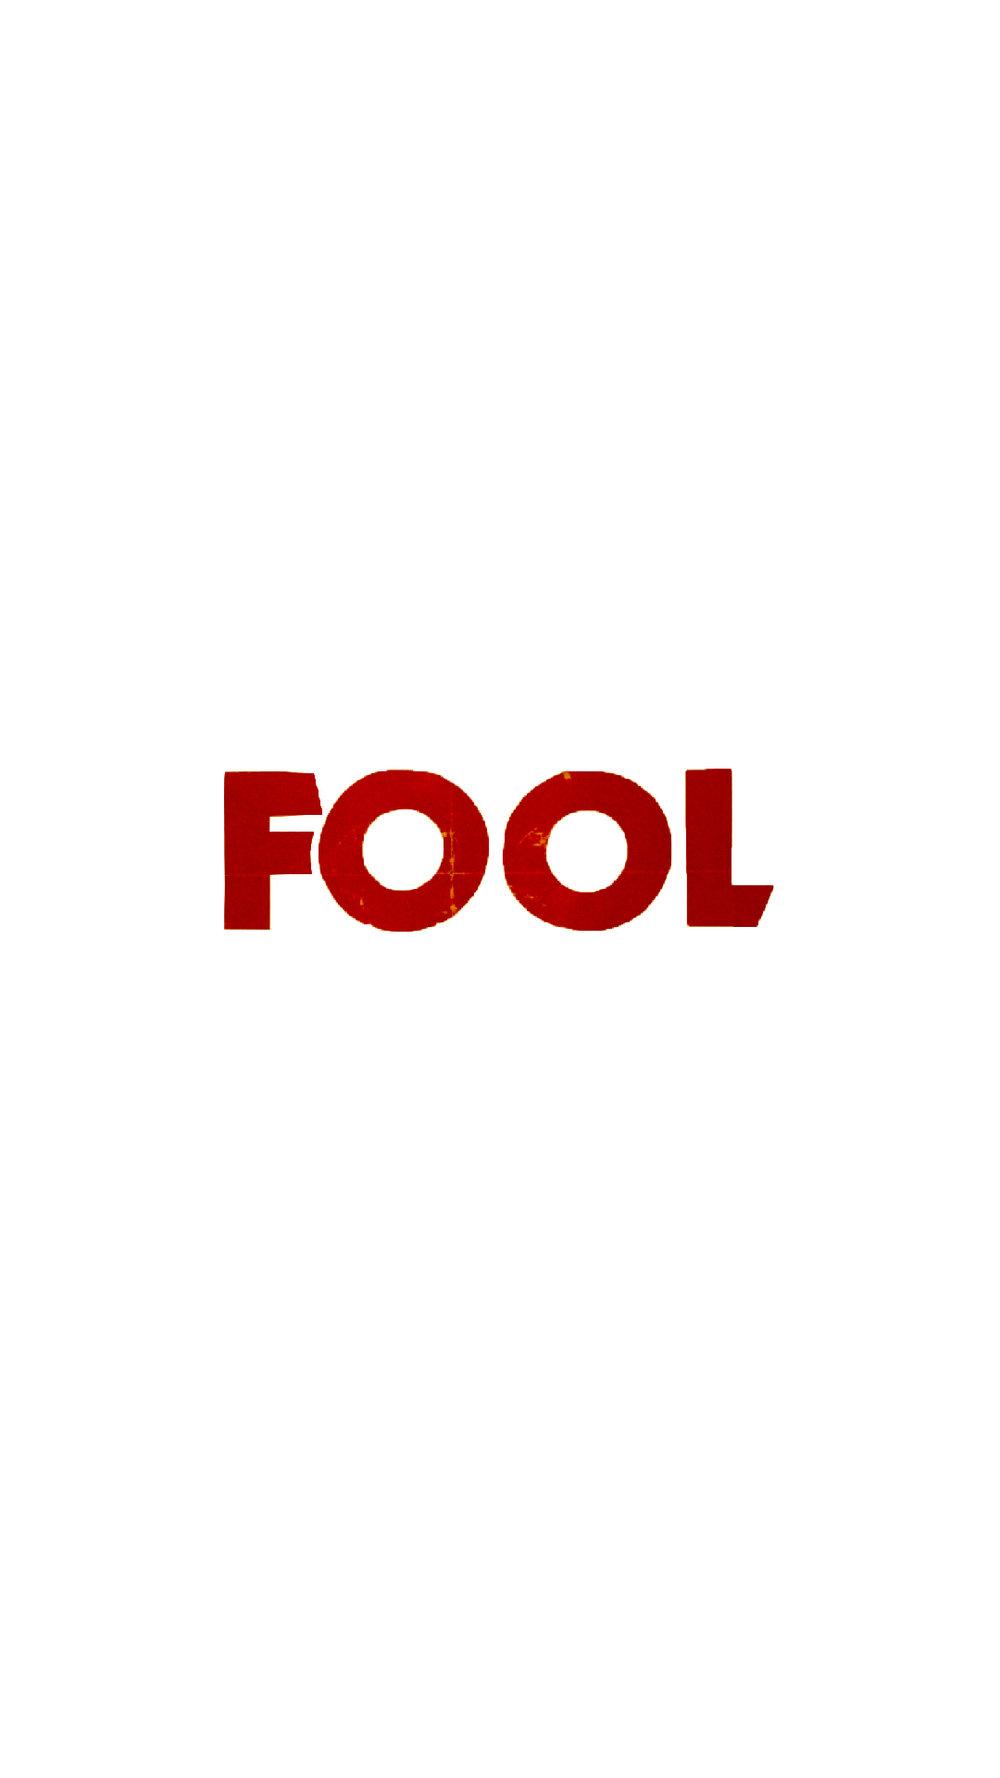 fool.jpg